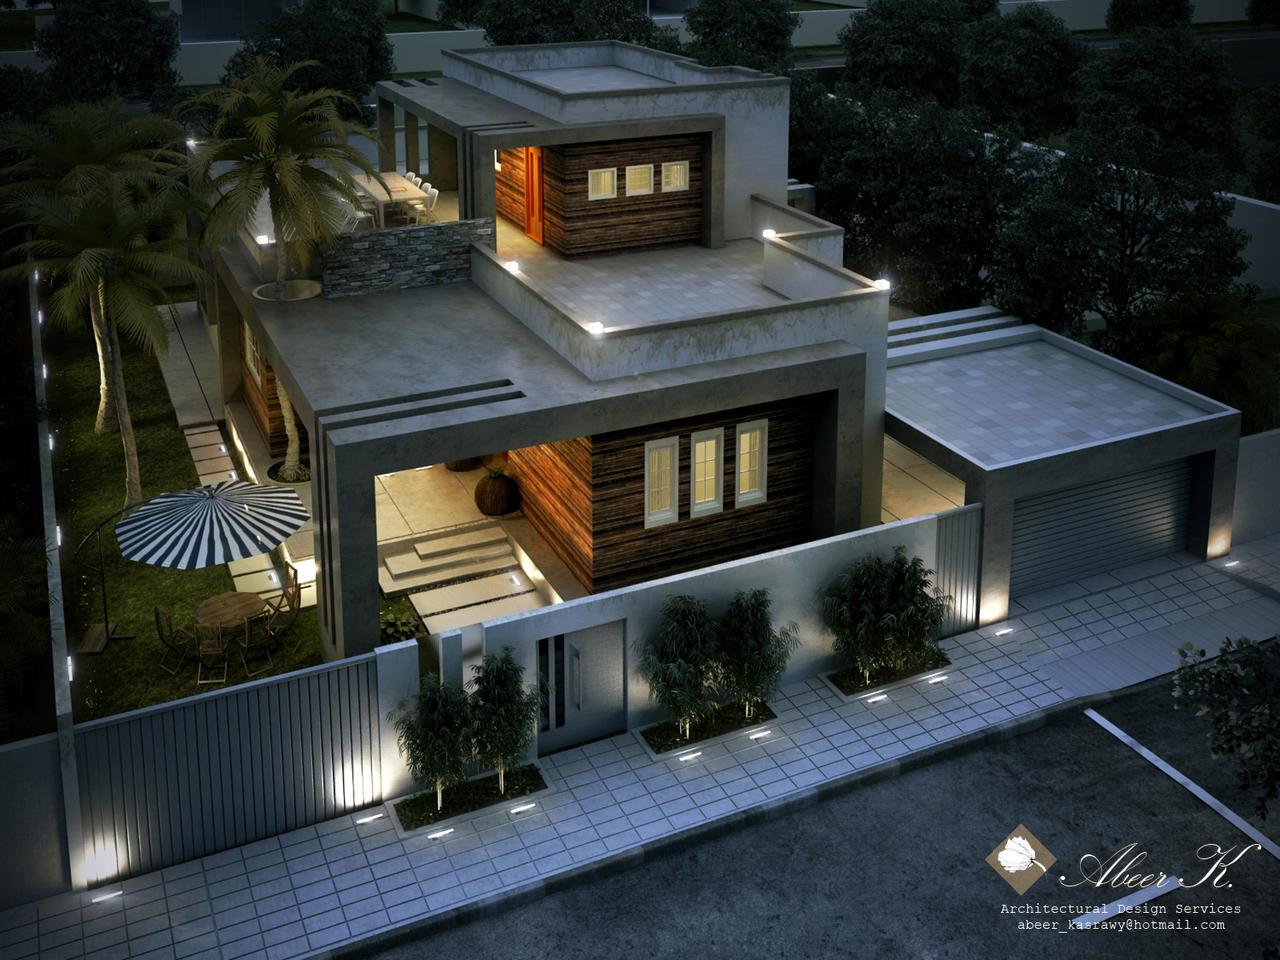 Libya contemp villa night render by kasrawy